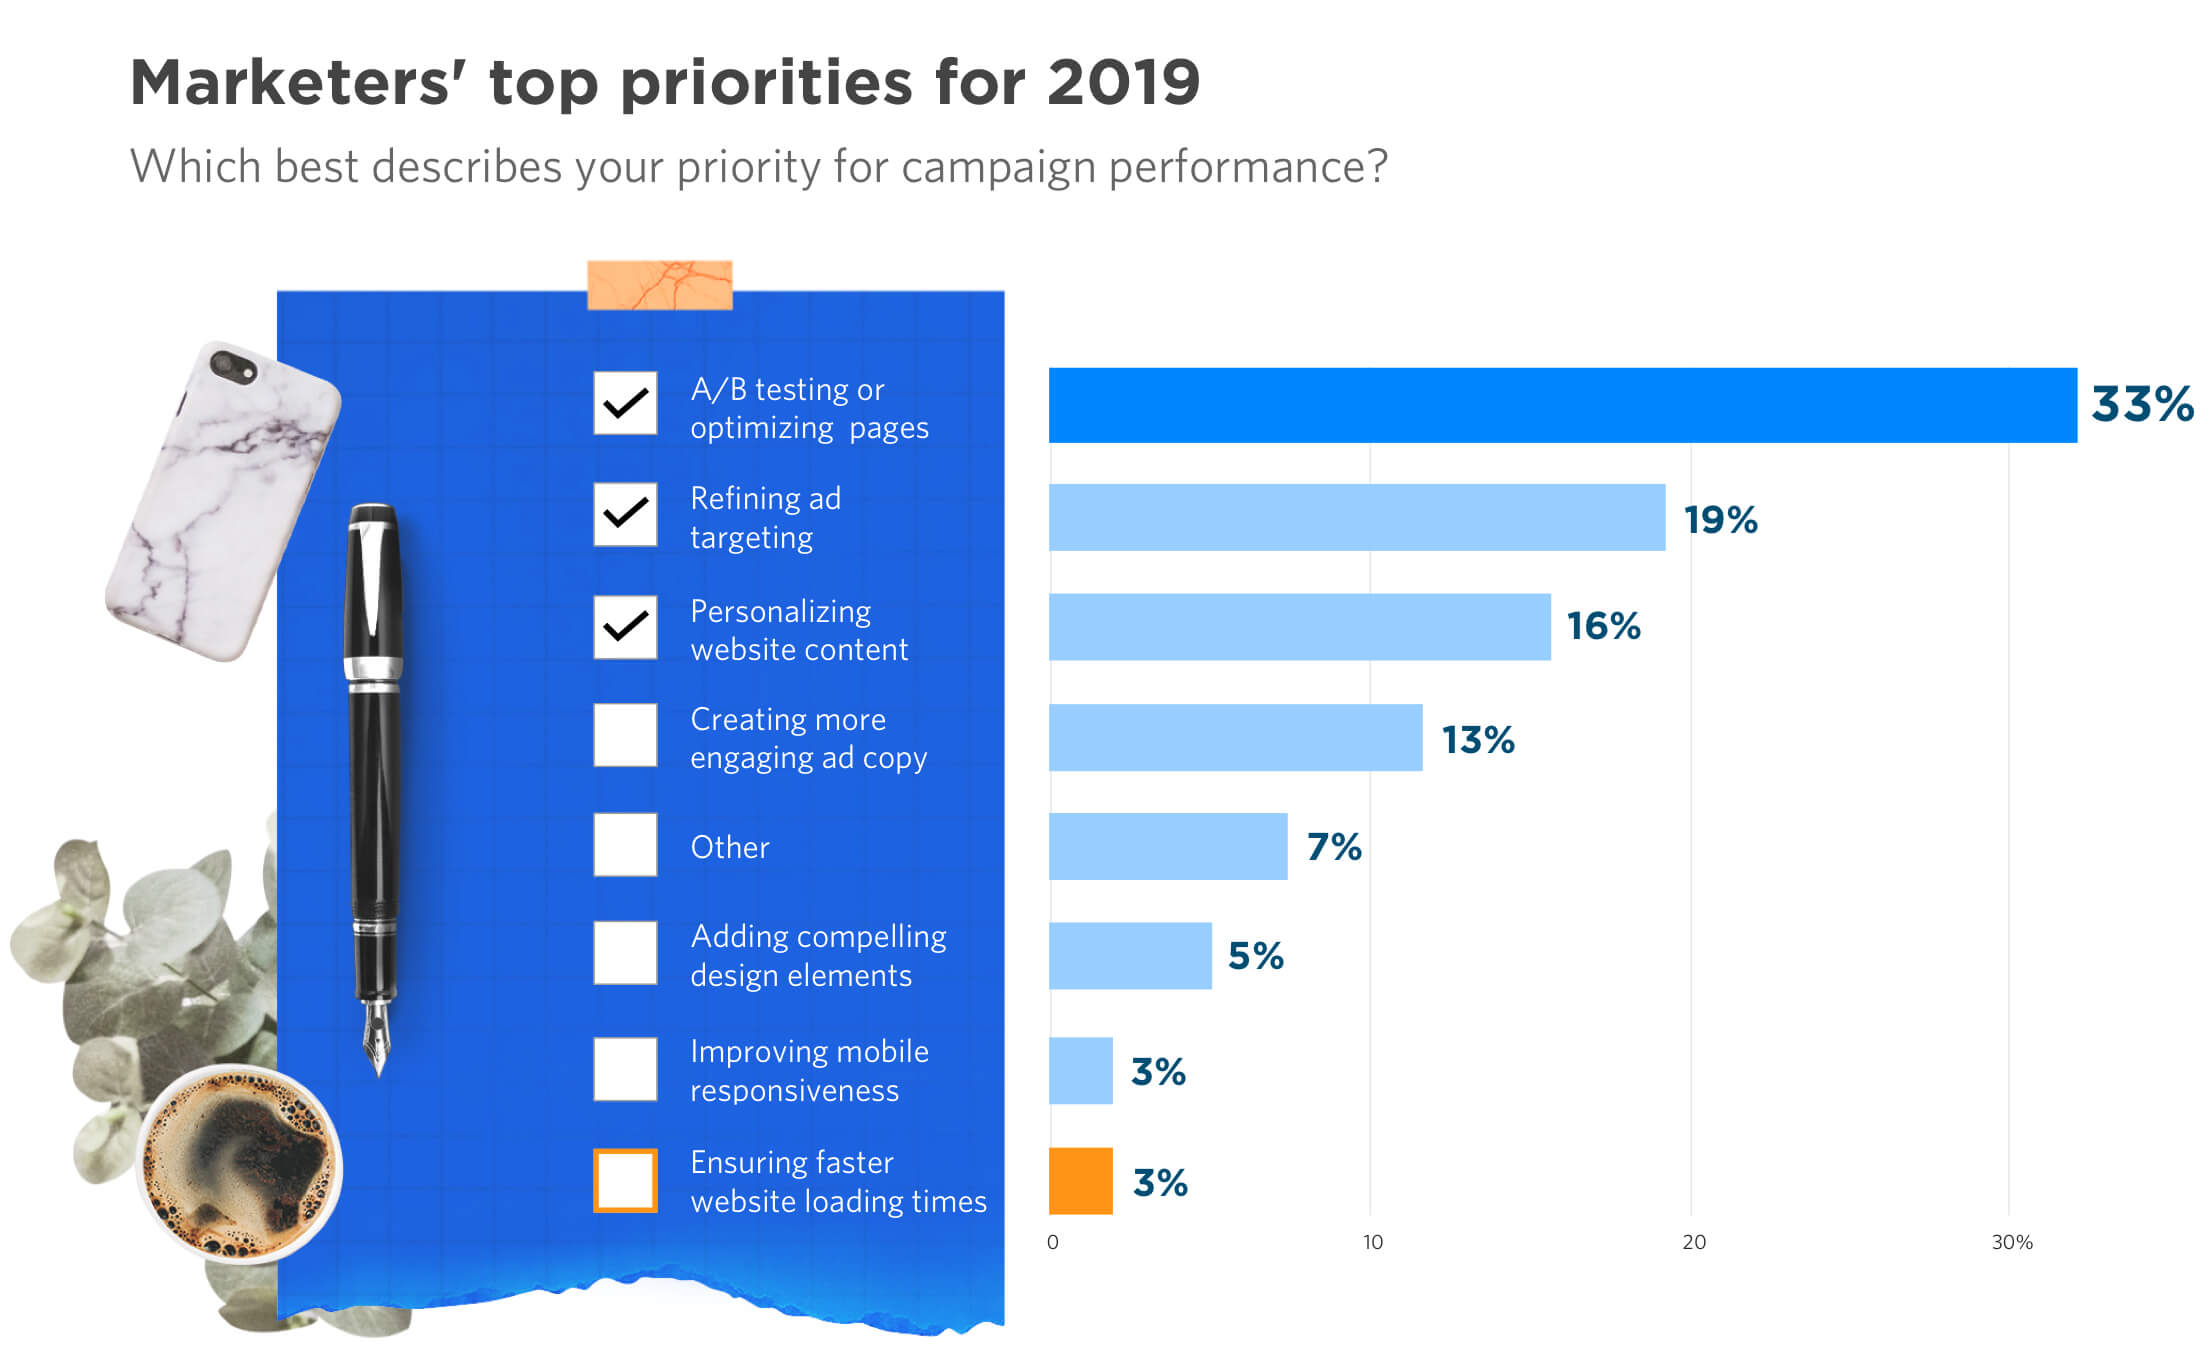 Marketers' Top 5 Priorities for 2019